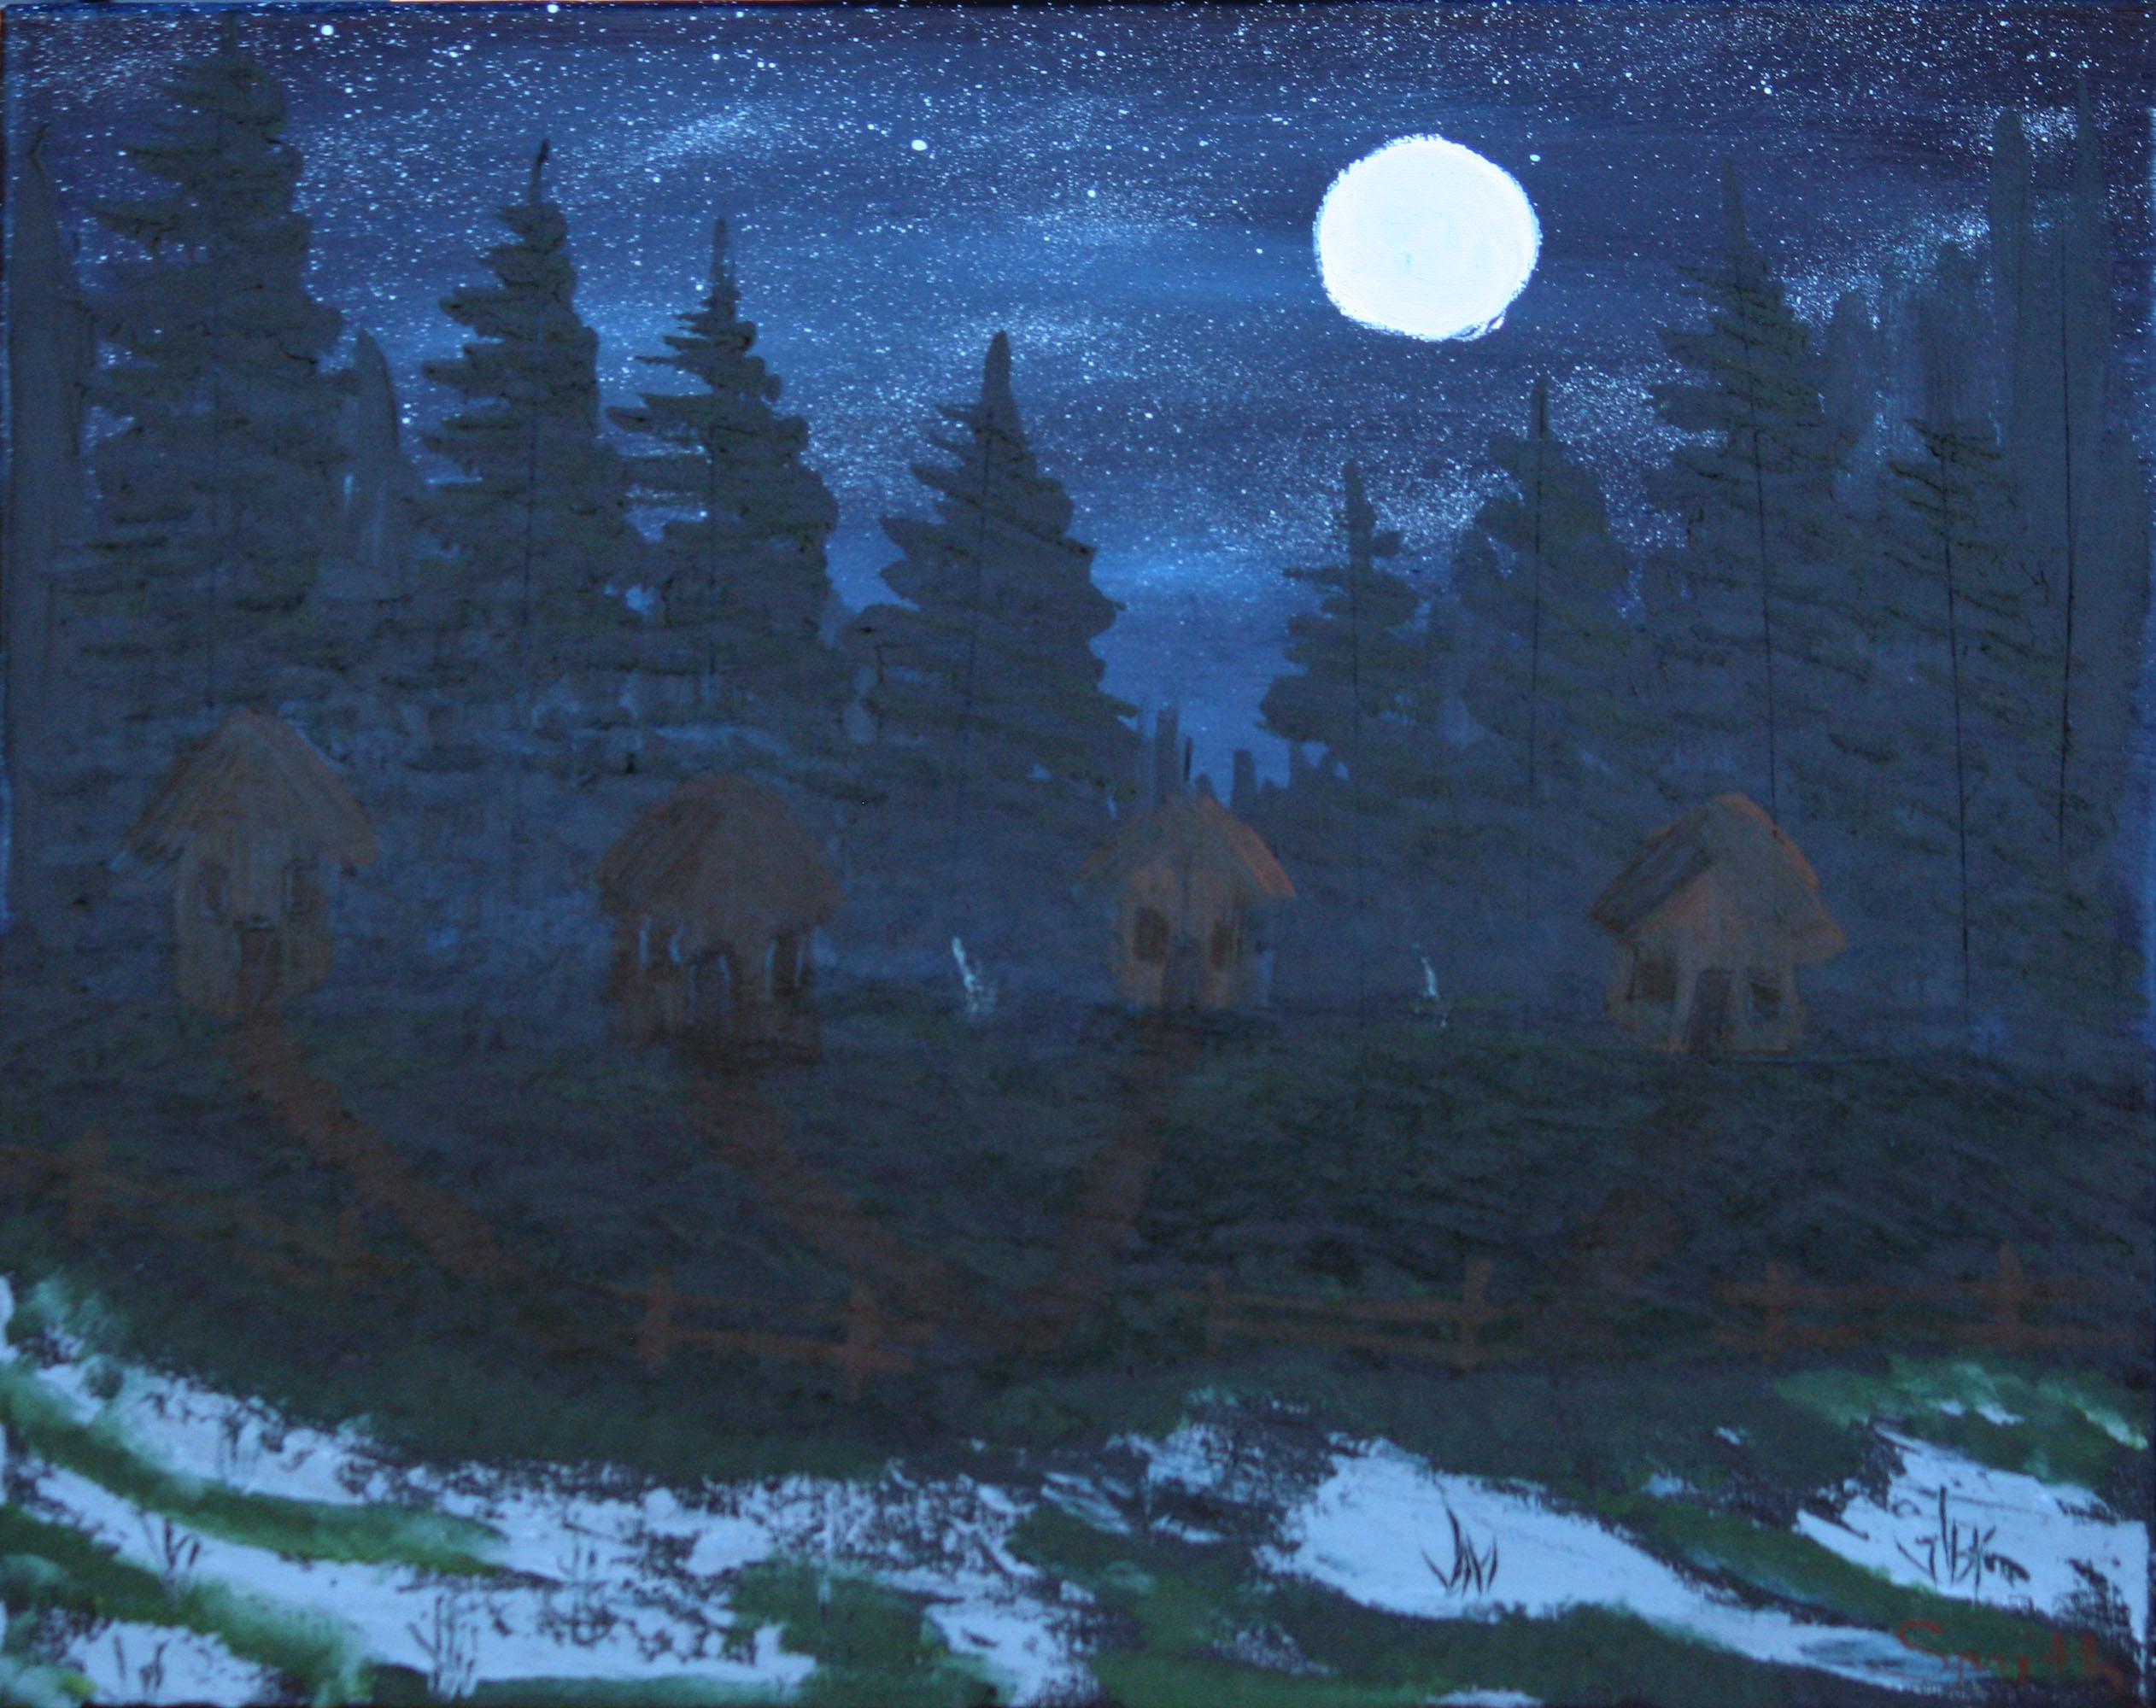 Nighttime-Summer-Camp